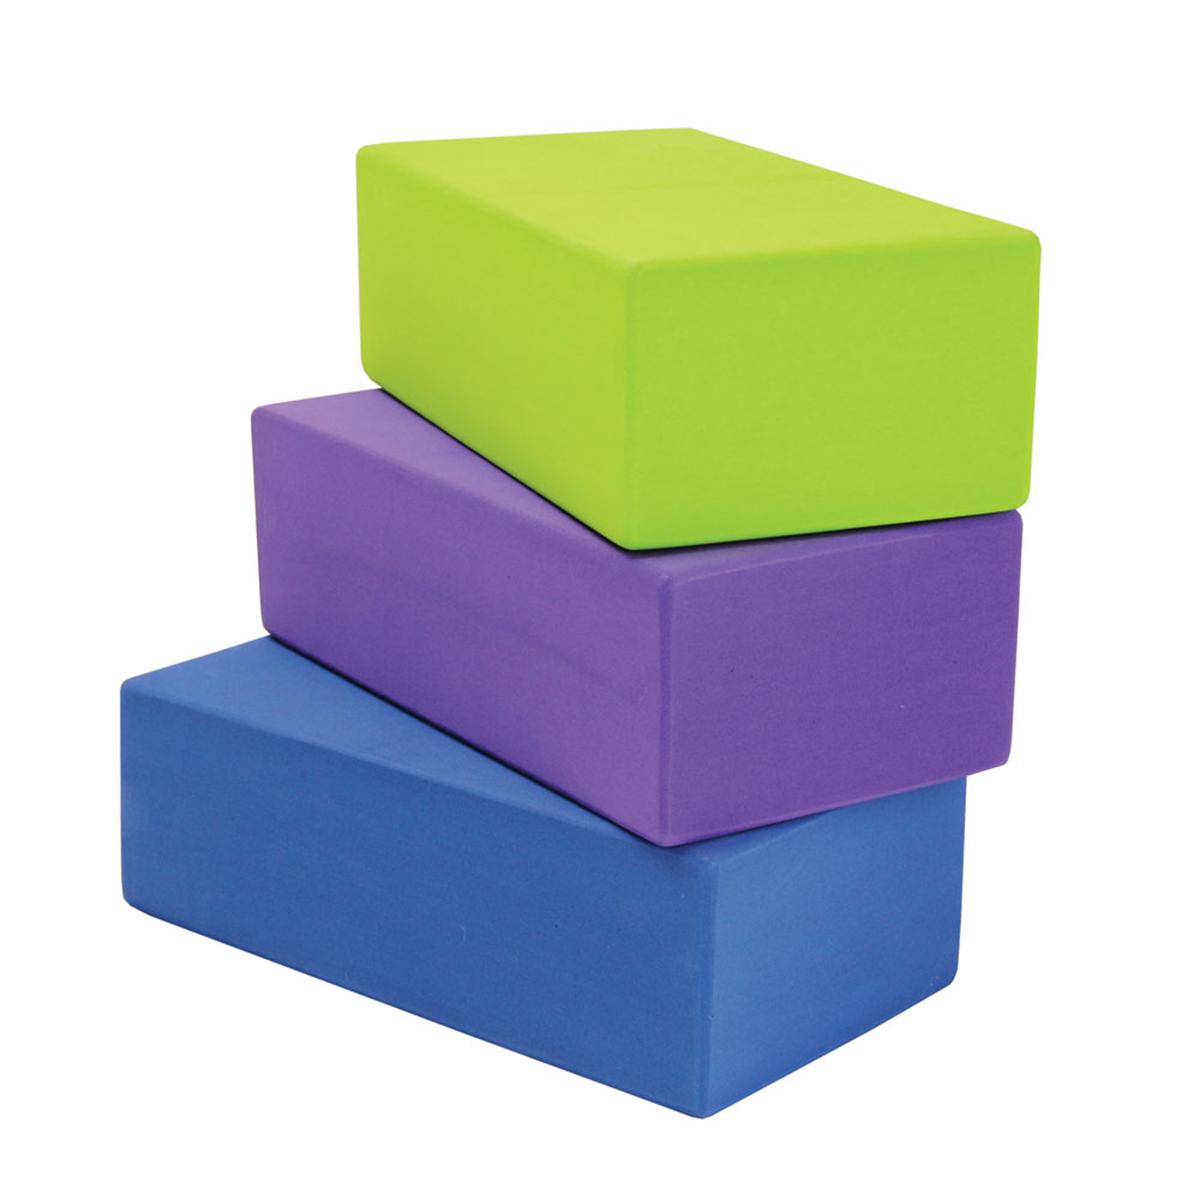 Block, two bricks & belt set